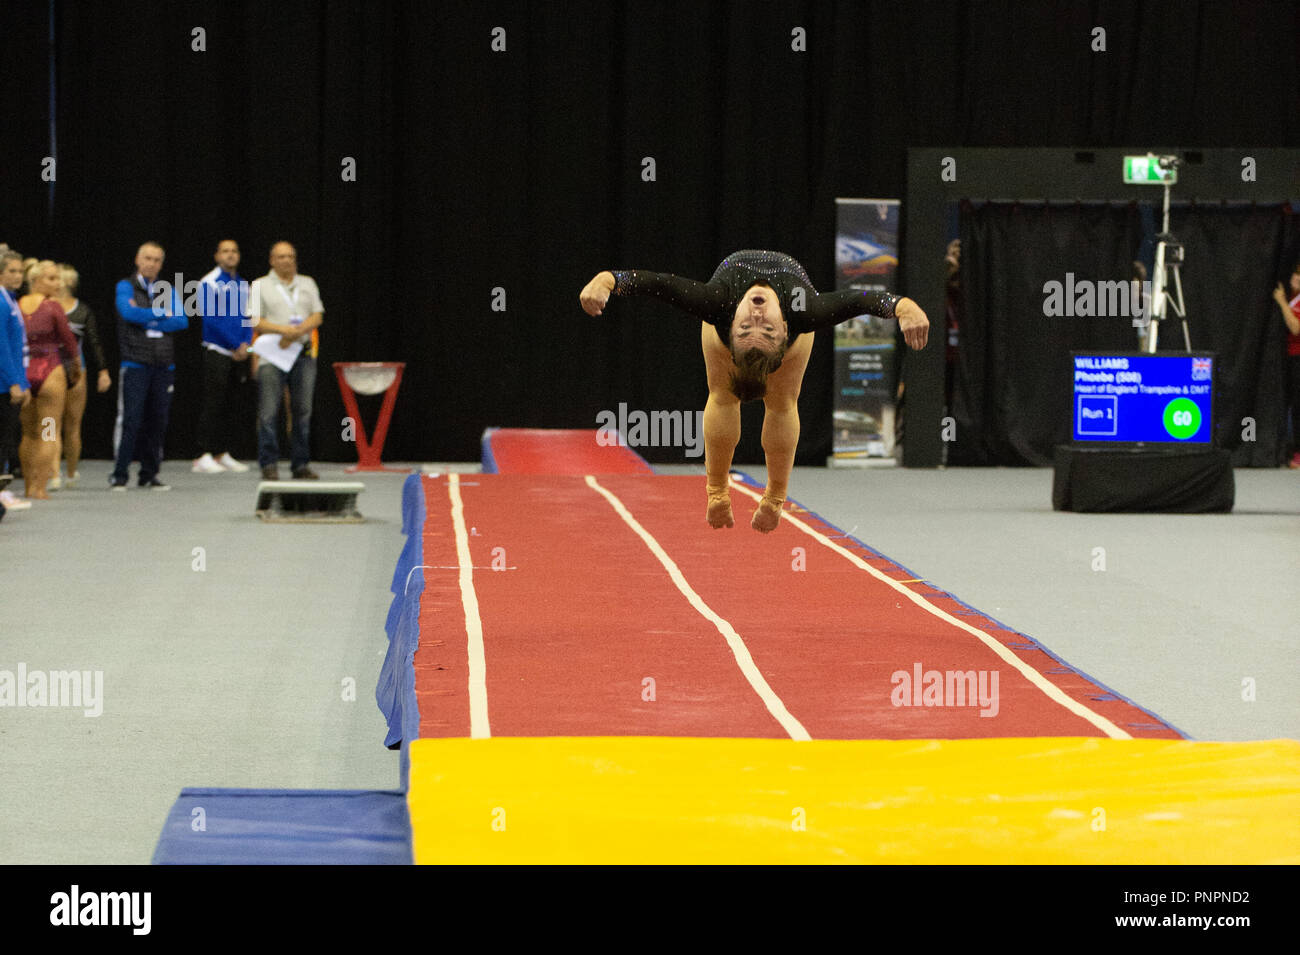 Birmingham, UK. 22nd September 2018. Megan Kealy, Milton Keynes Gymnastics completing a pass during British Gymnastics Trampoline, DMT and Tumbling British Championships 2018 at the Arena Birmingham, Birmingham, UK. Credit: Iain Scott Photography/Alamy Live News - Stock Image